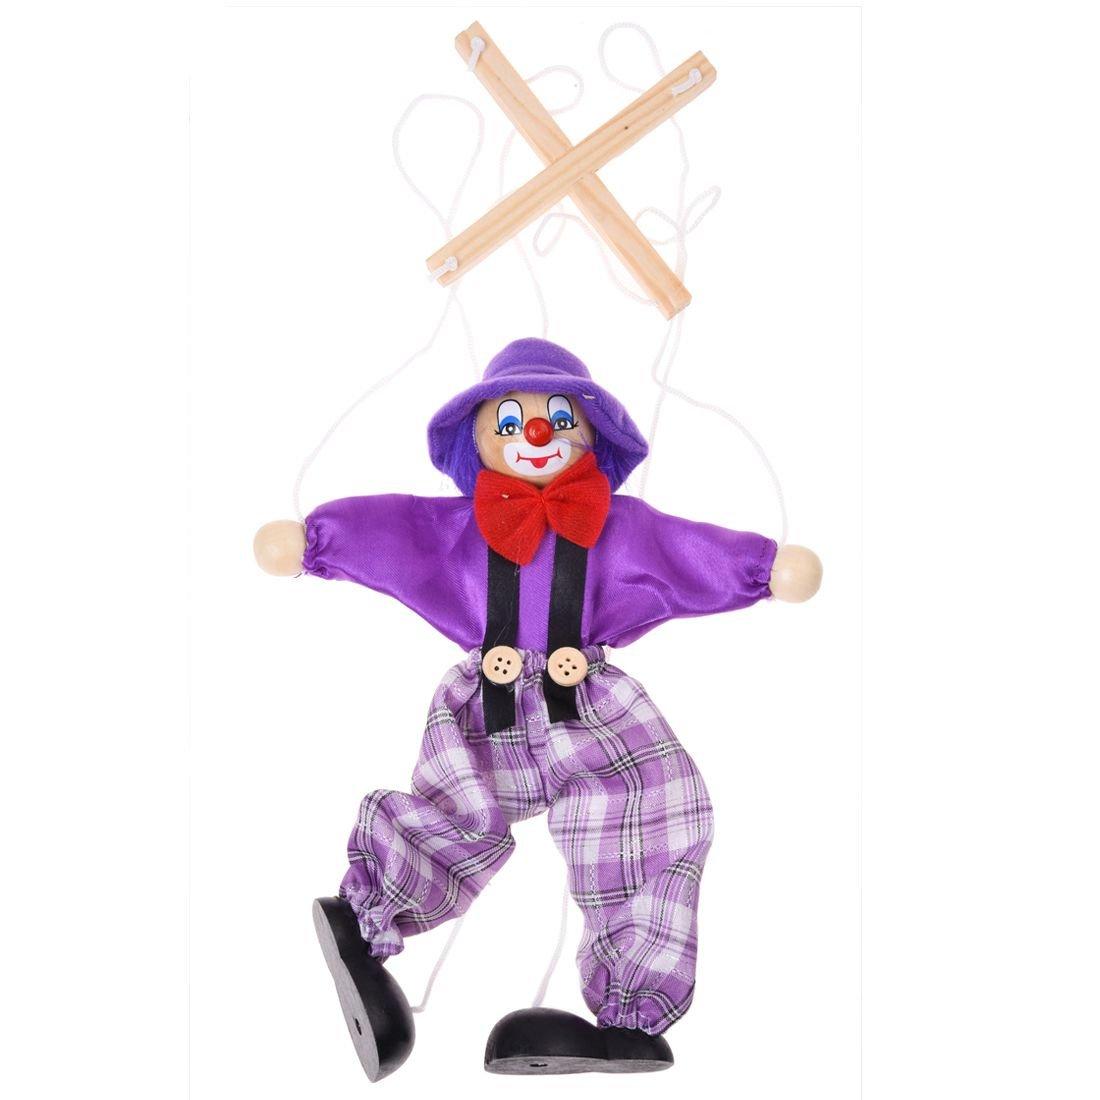 Puppet Toy - SODIAL(R)1pcs children's doll clown toy - random color 038861